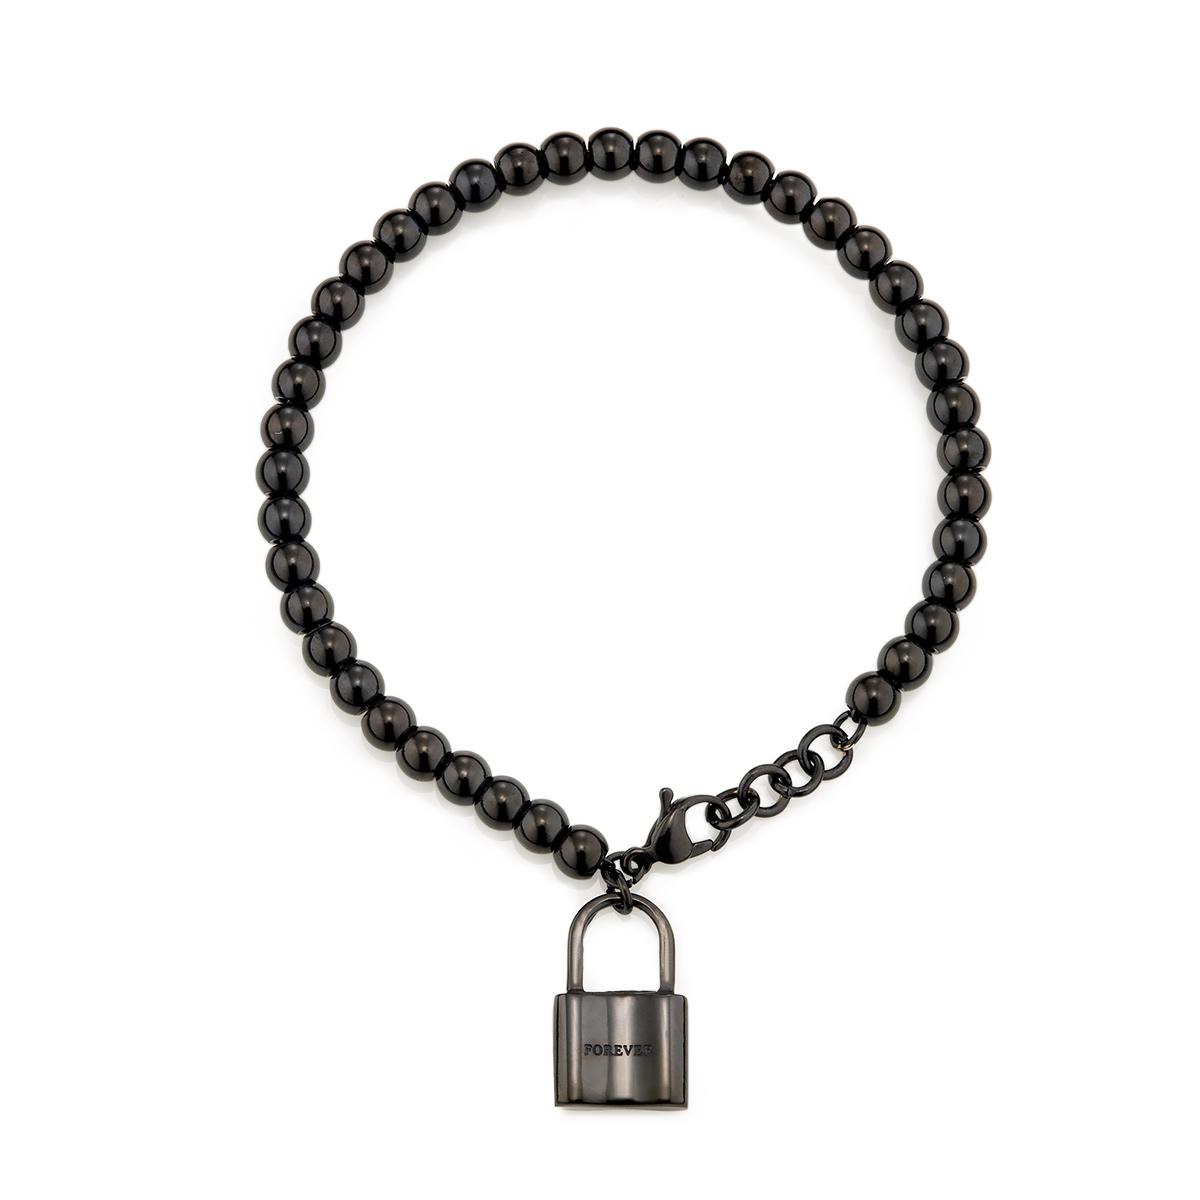 CIXM180 點滴意象-心鎖串珠手鍊